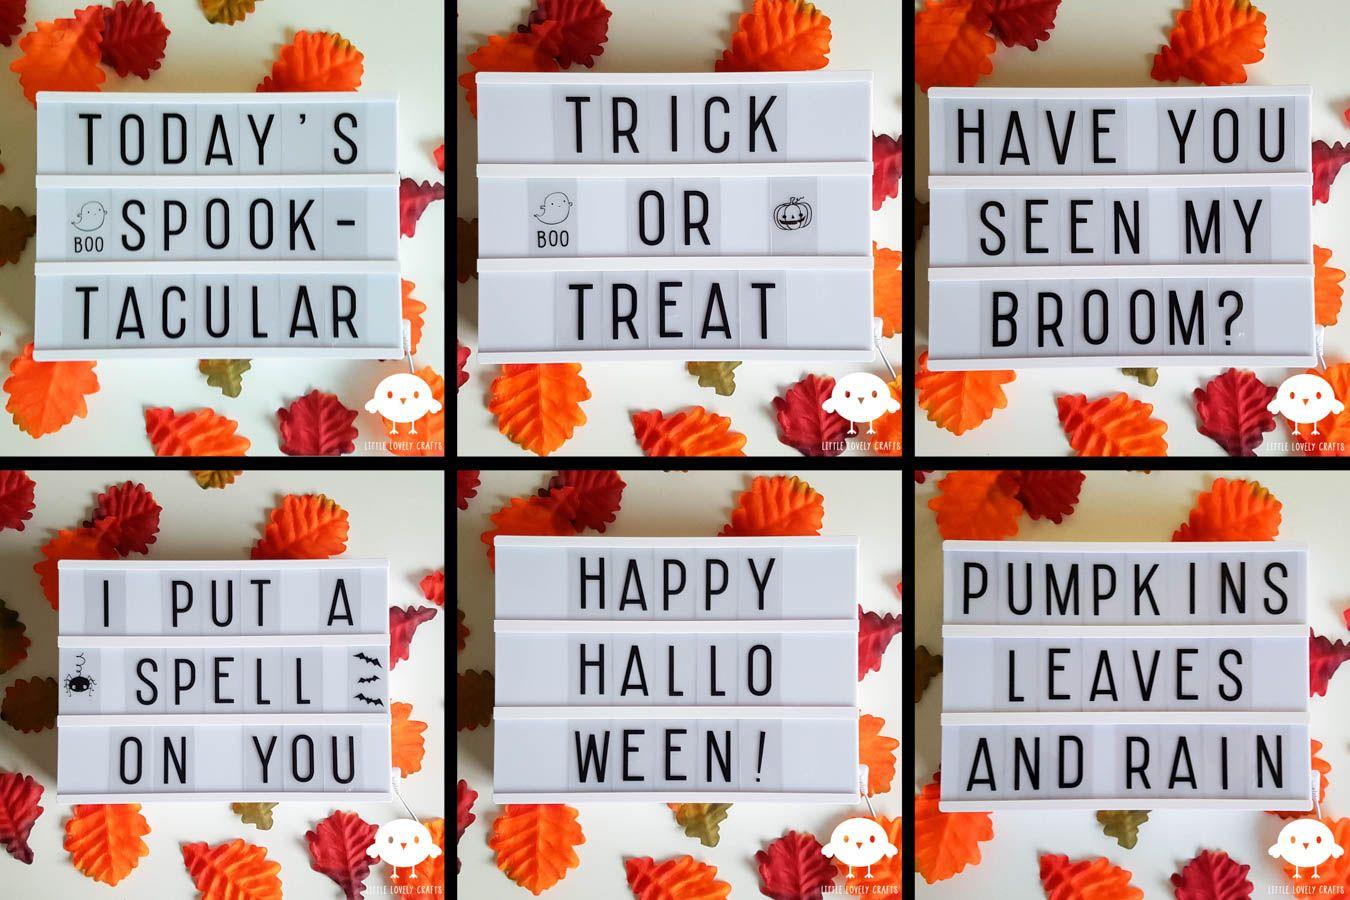 Lightbox Ideas For Halloween Light Box Quotes Cinema Light Box Quotes Message Light Box